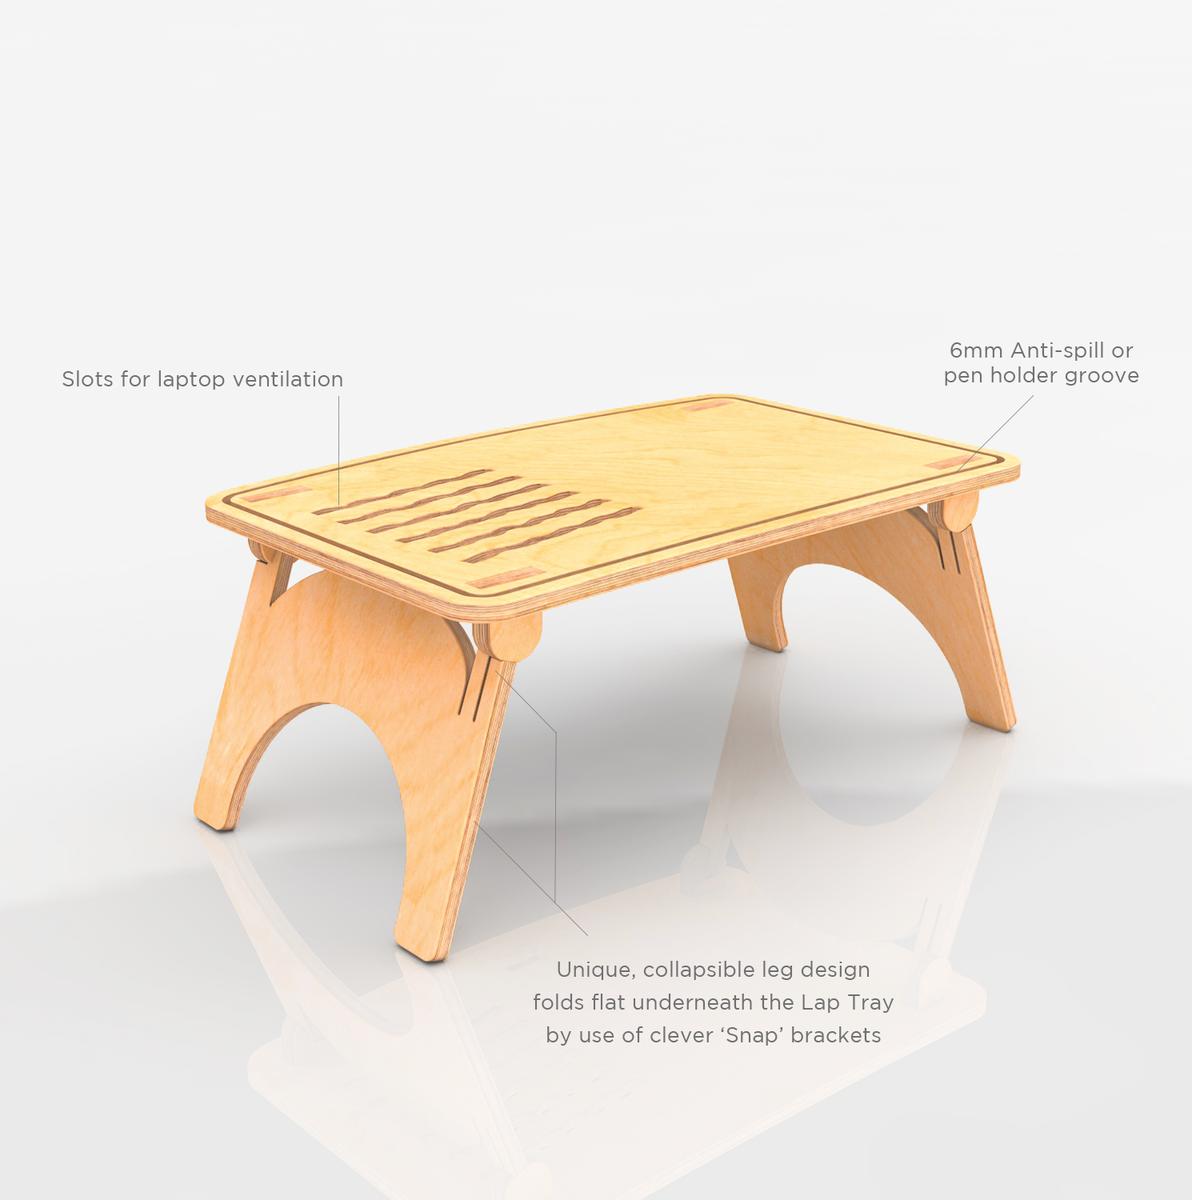 Deskstand Sit Stand Lap Table